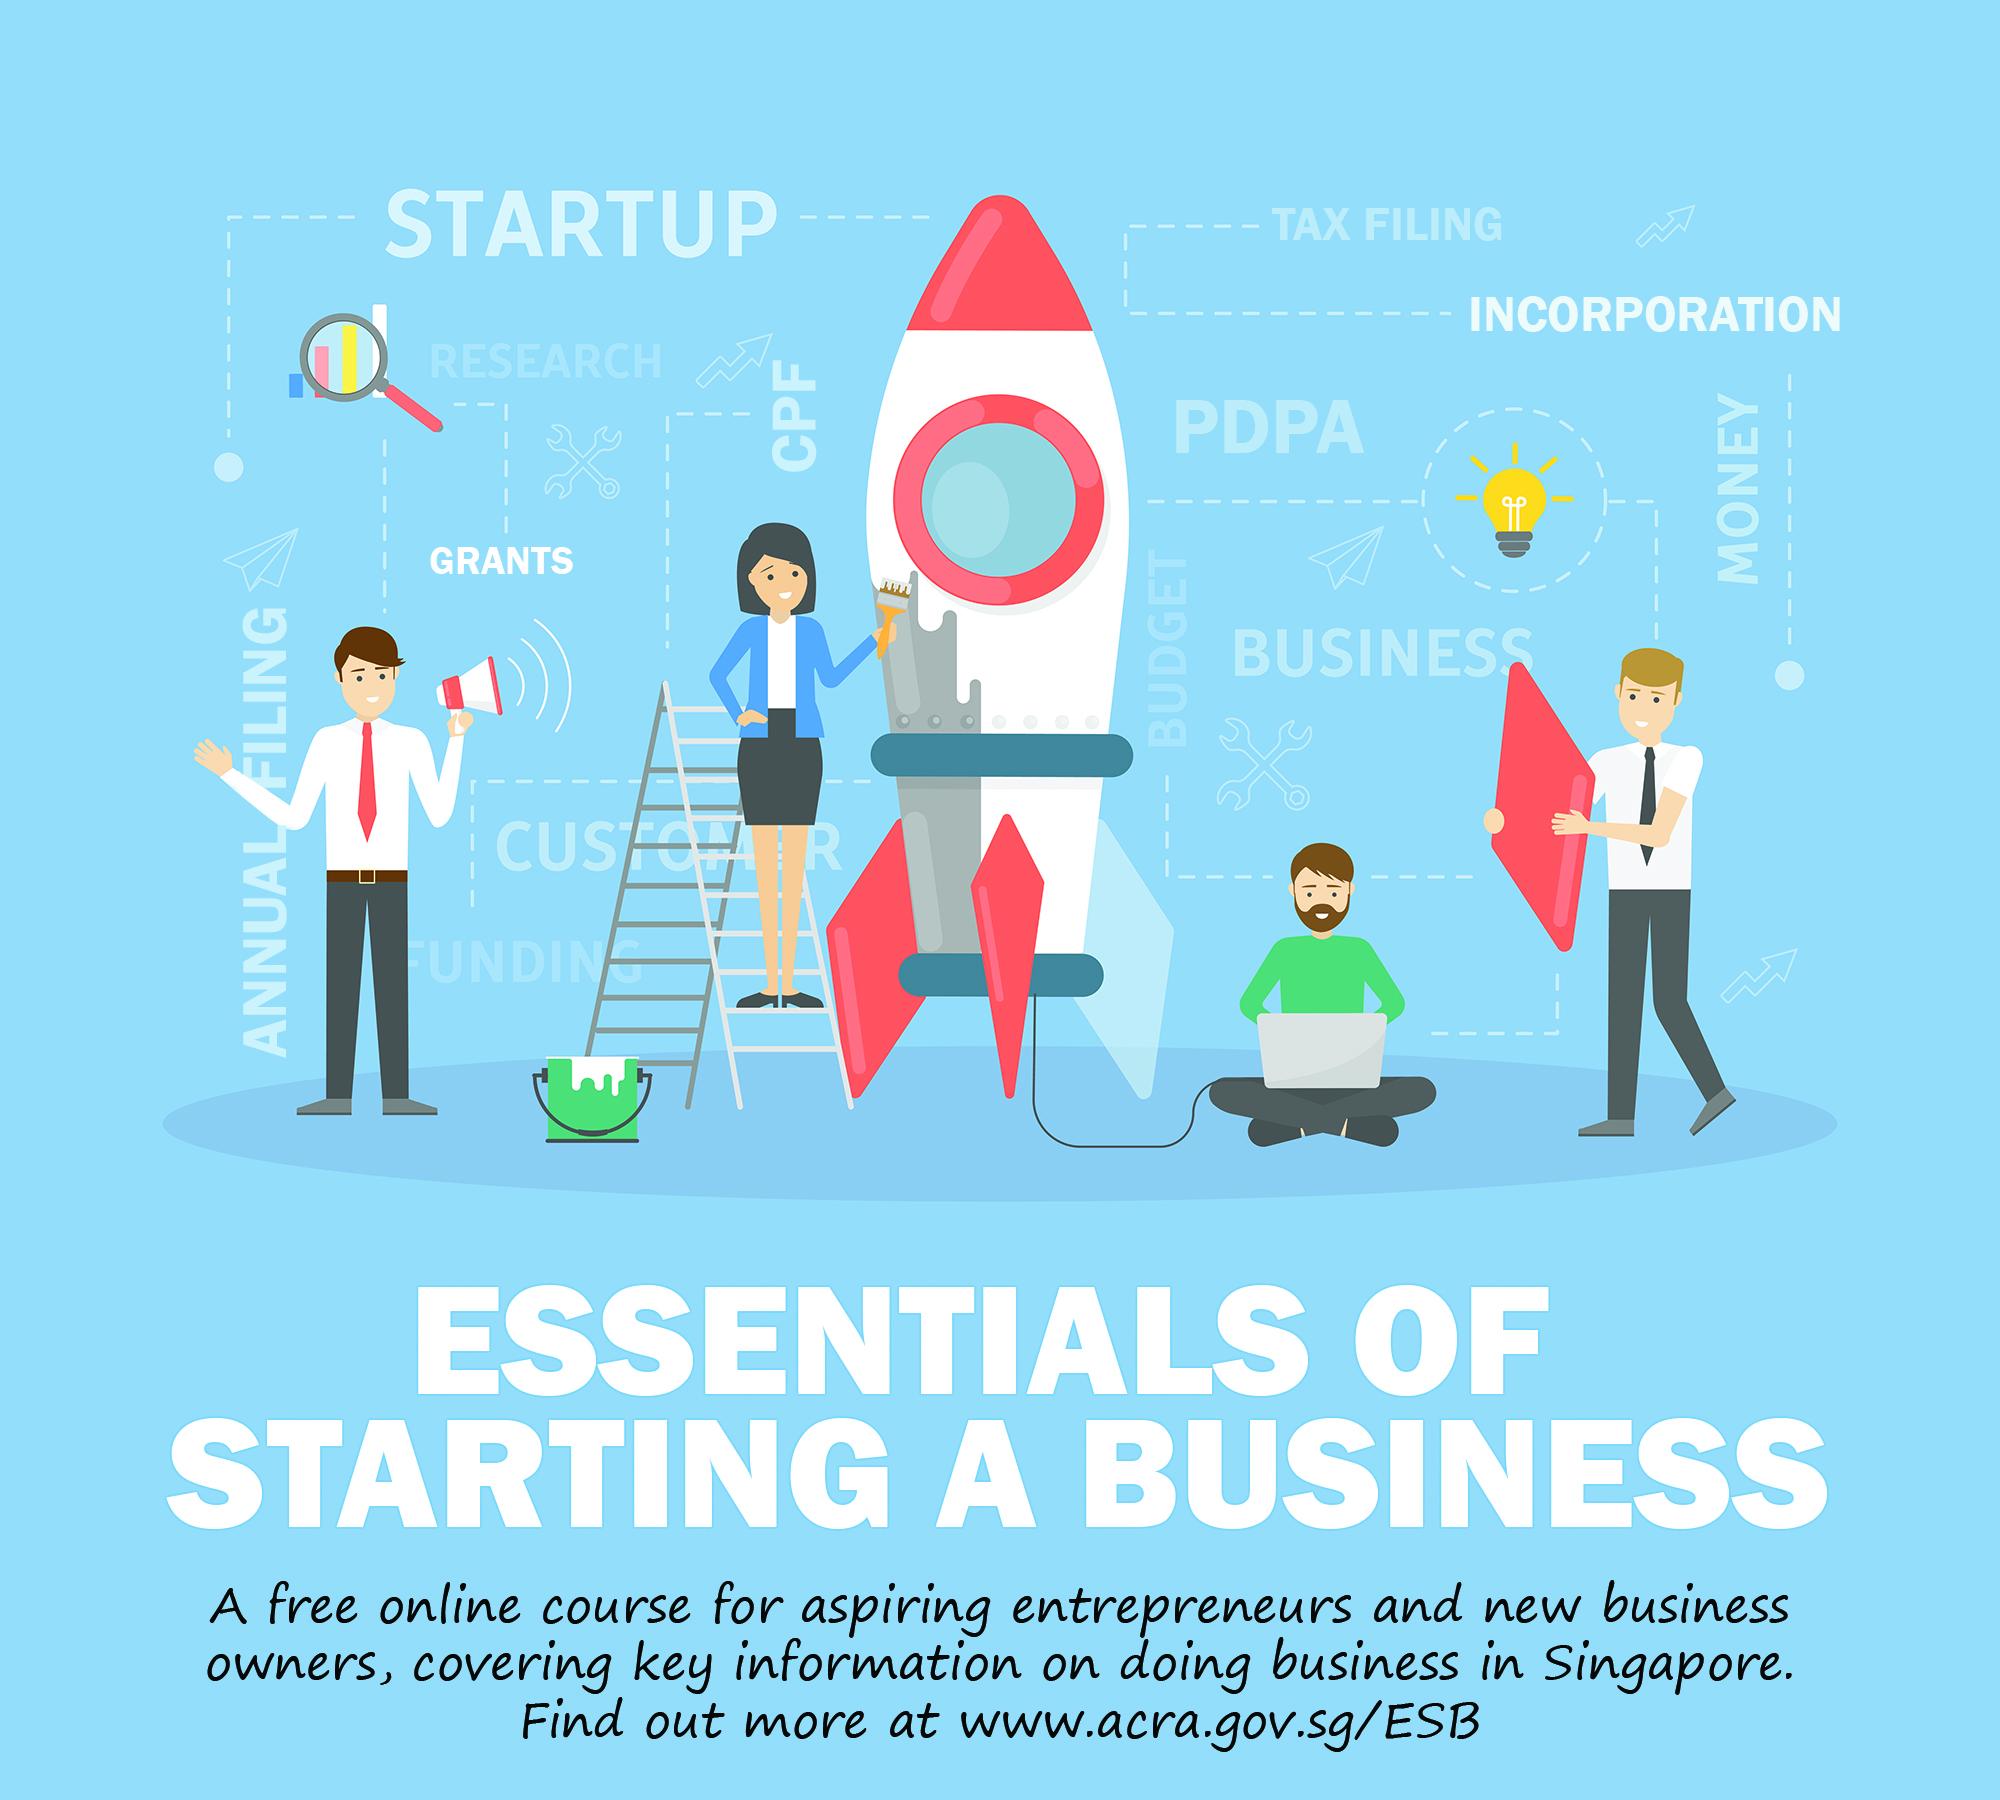 Essentials of starting a business